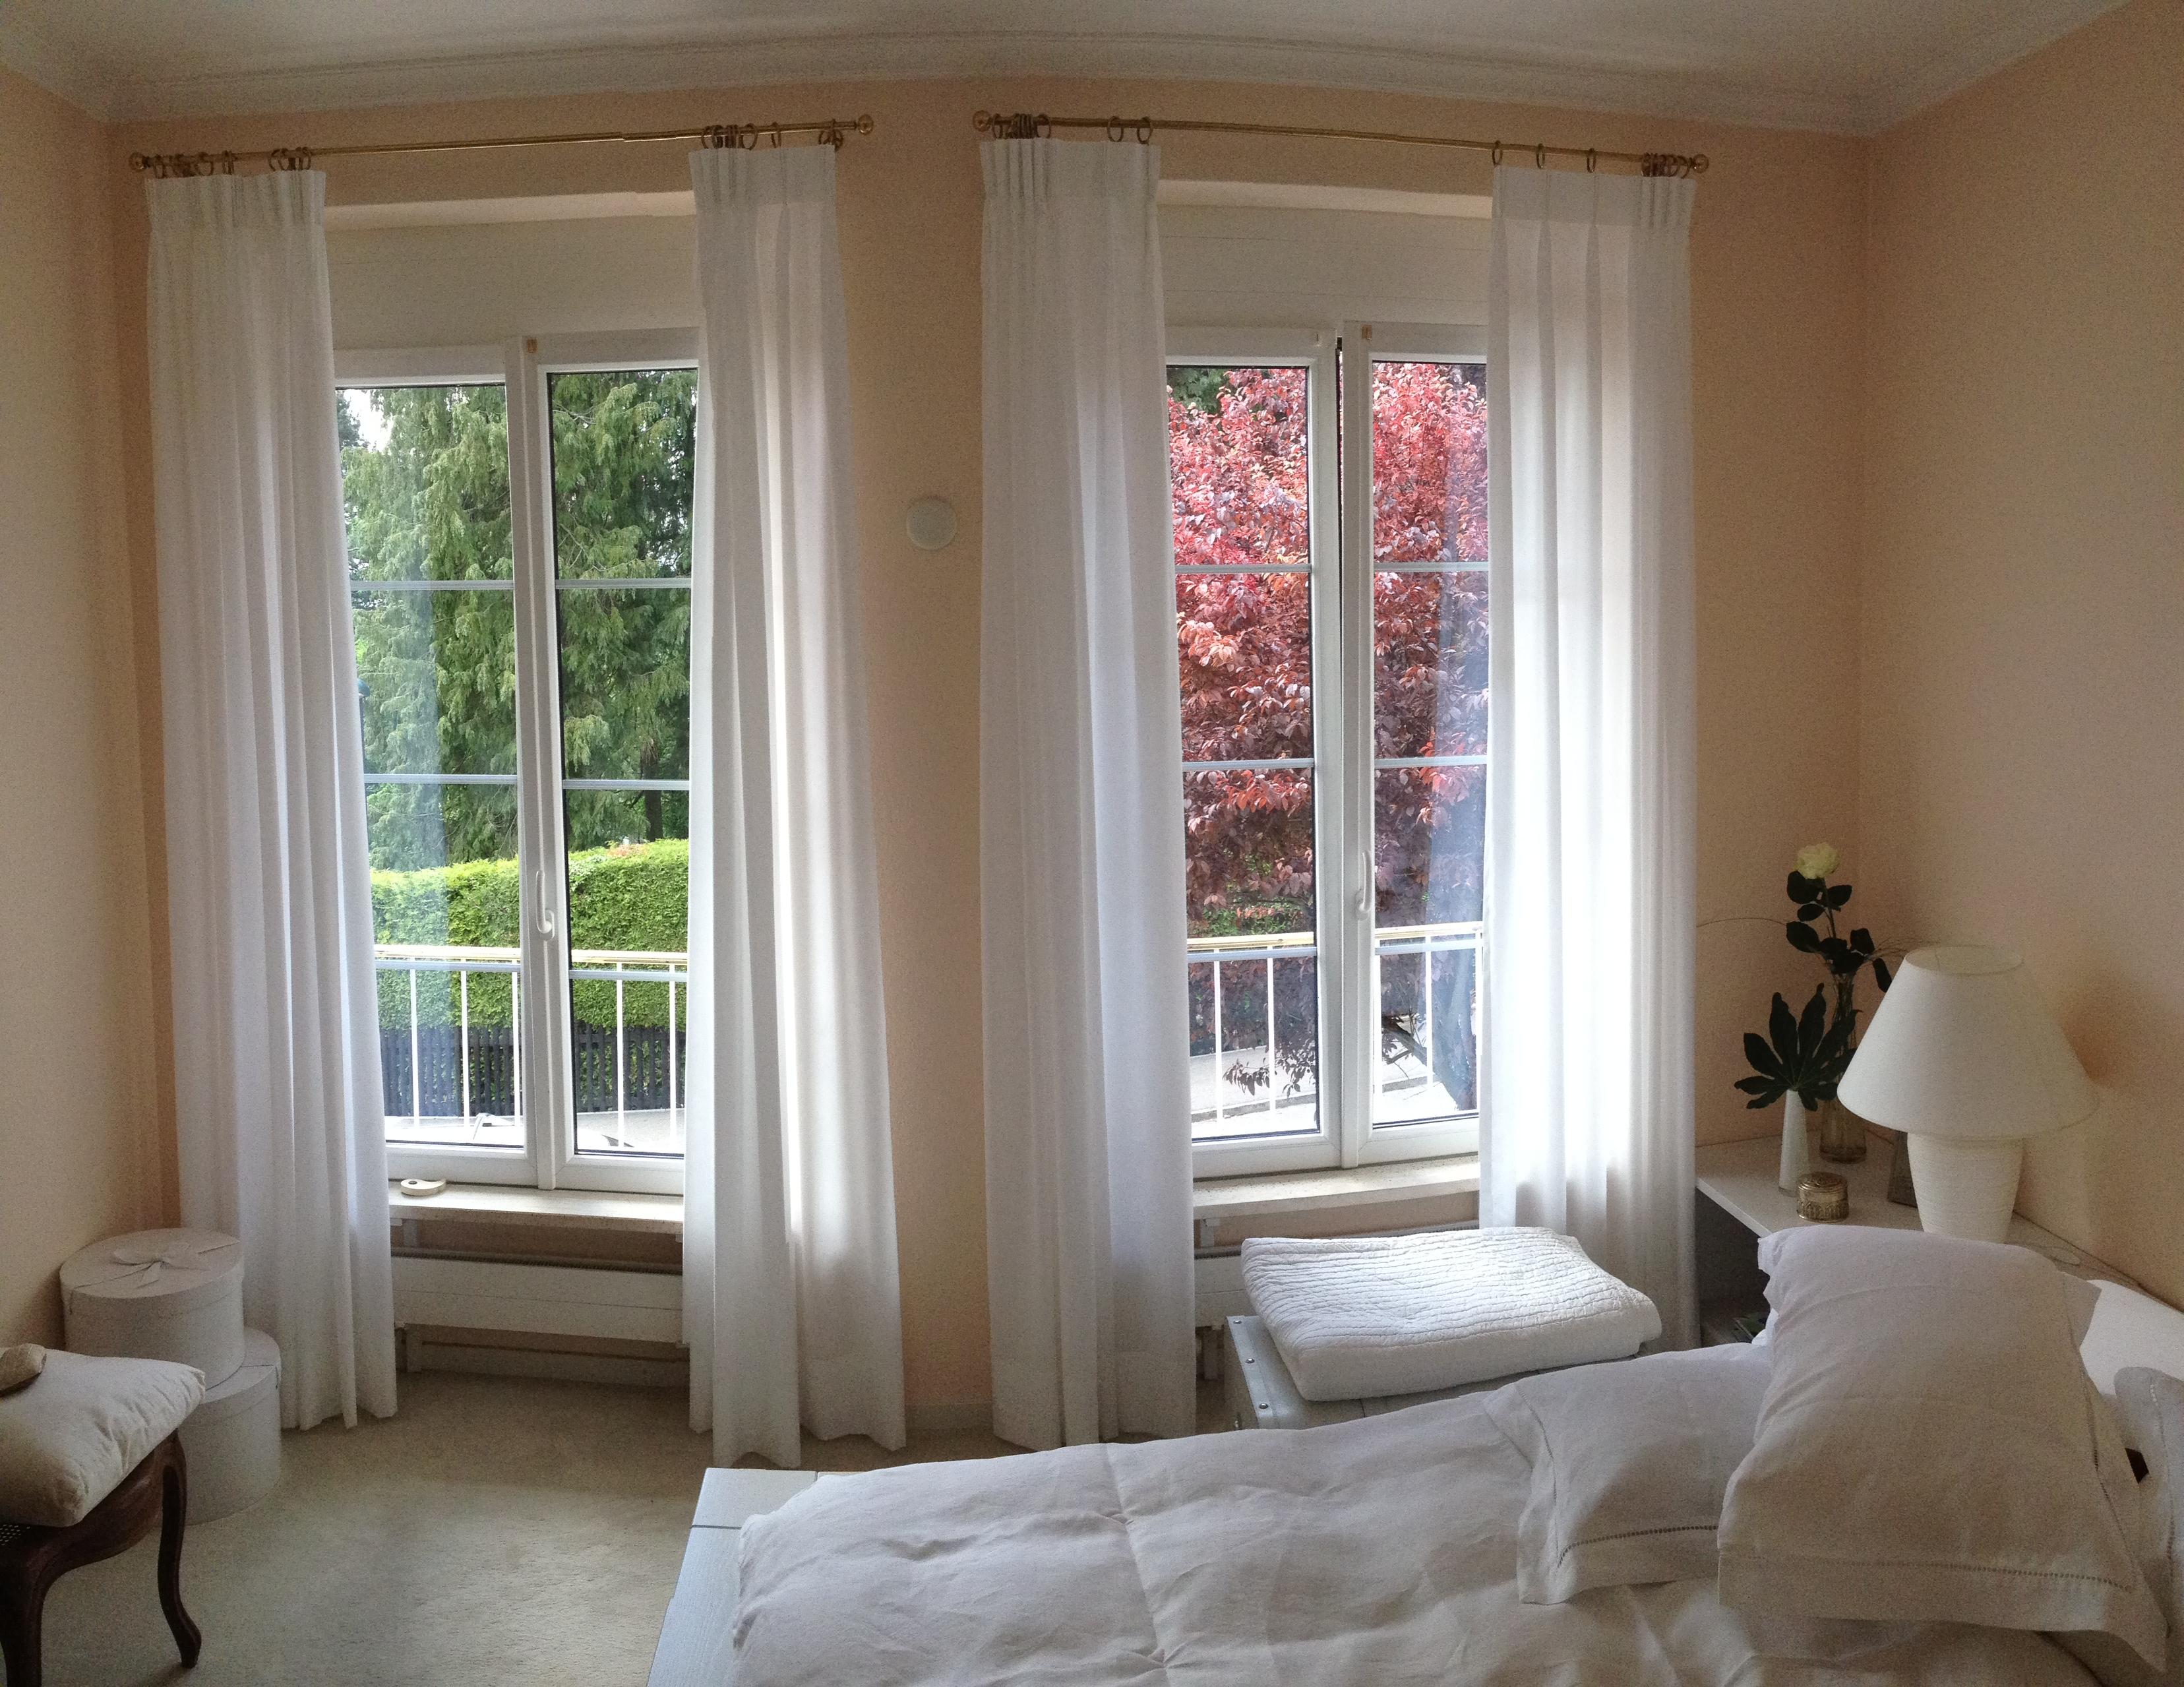 blickdichter stoff an stangengarnitur mit fl mischem kopf. Black Bedroom Furniture Sets. Home Design Ideas